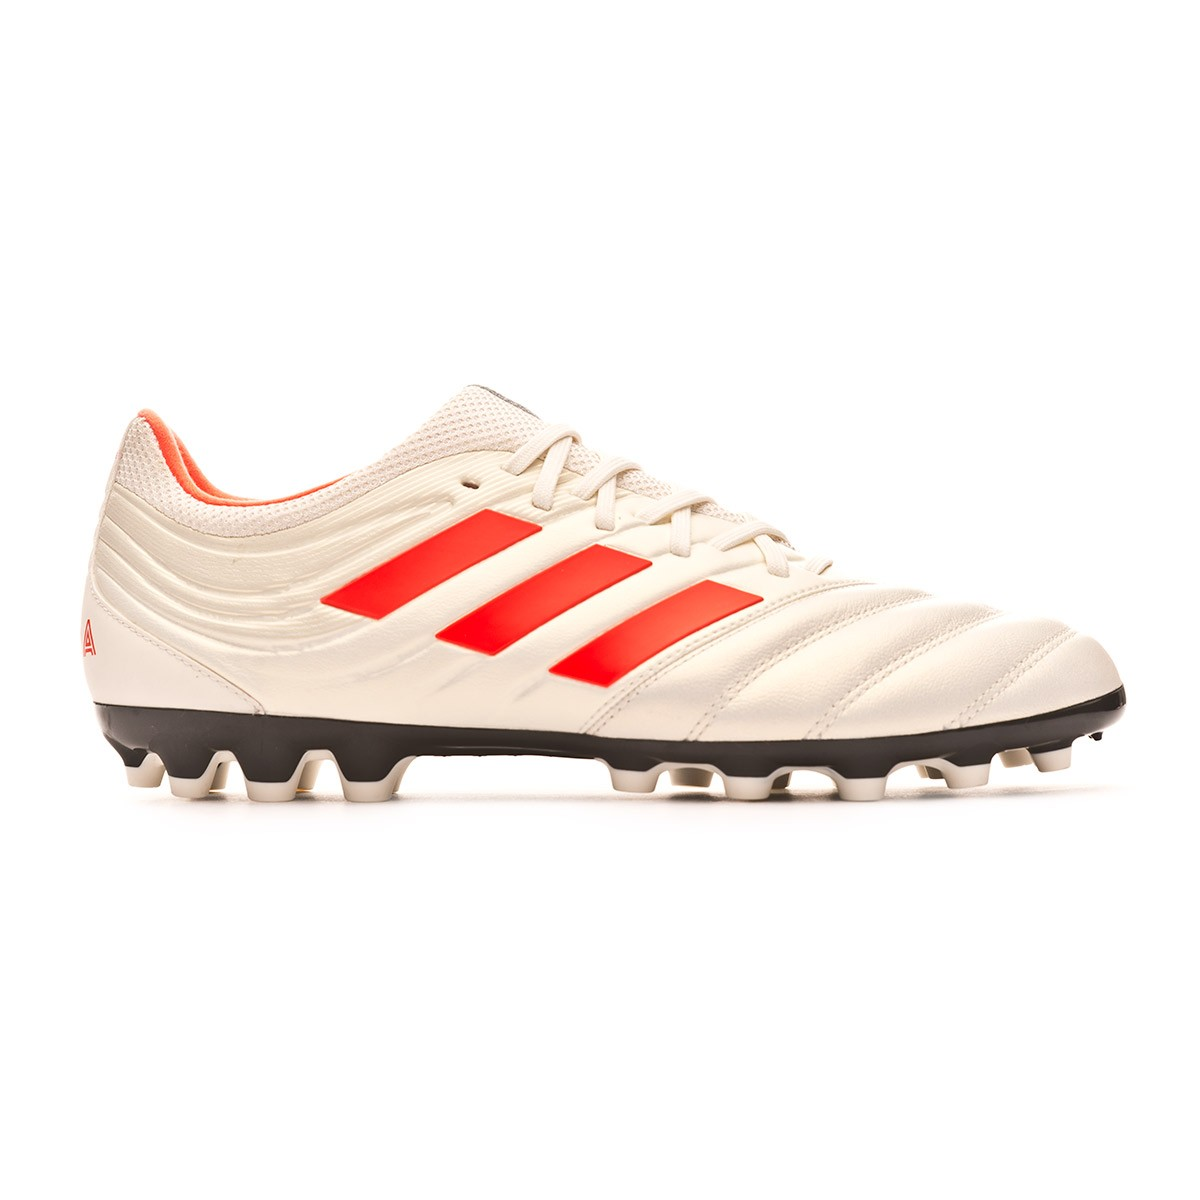 02da045076e Football Boots adidas Copa 19.3 AG Off white-Solar red-Core black -  Football store Fútbol Emotion